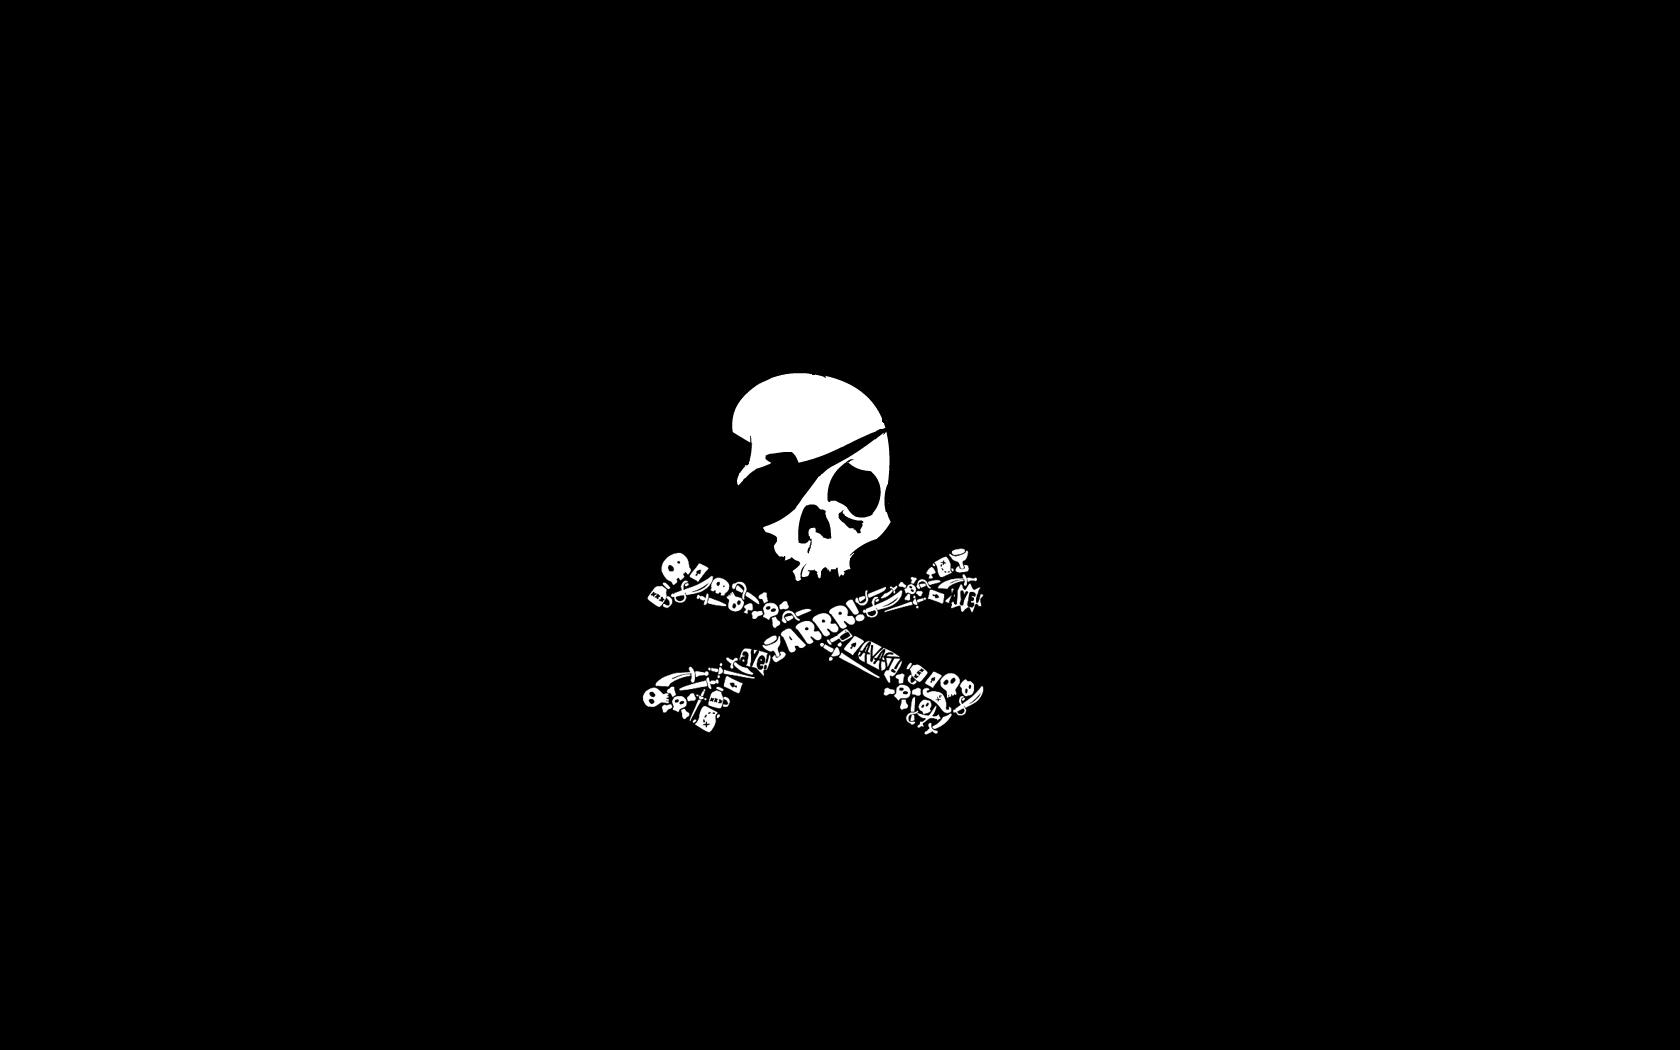 wallpaper skull bones pirate - photo #19